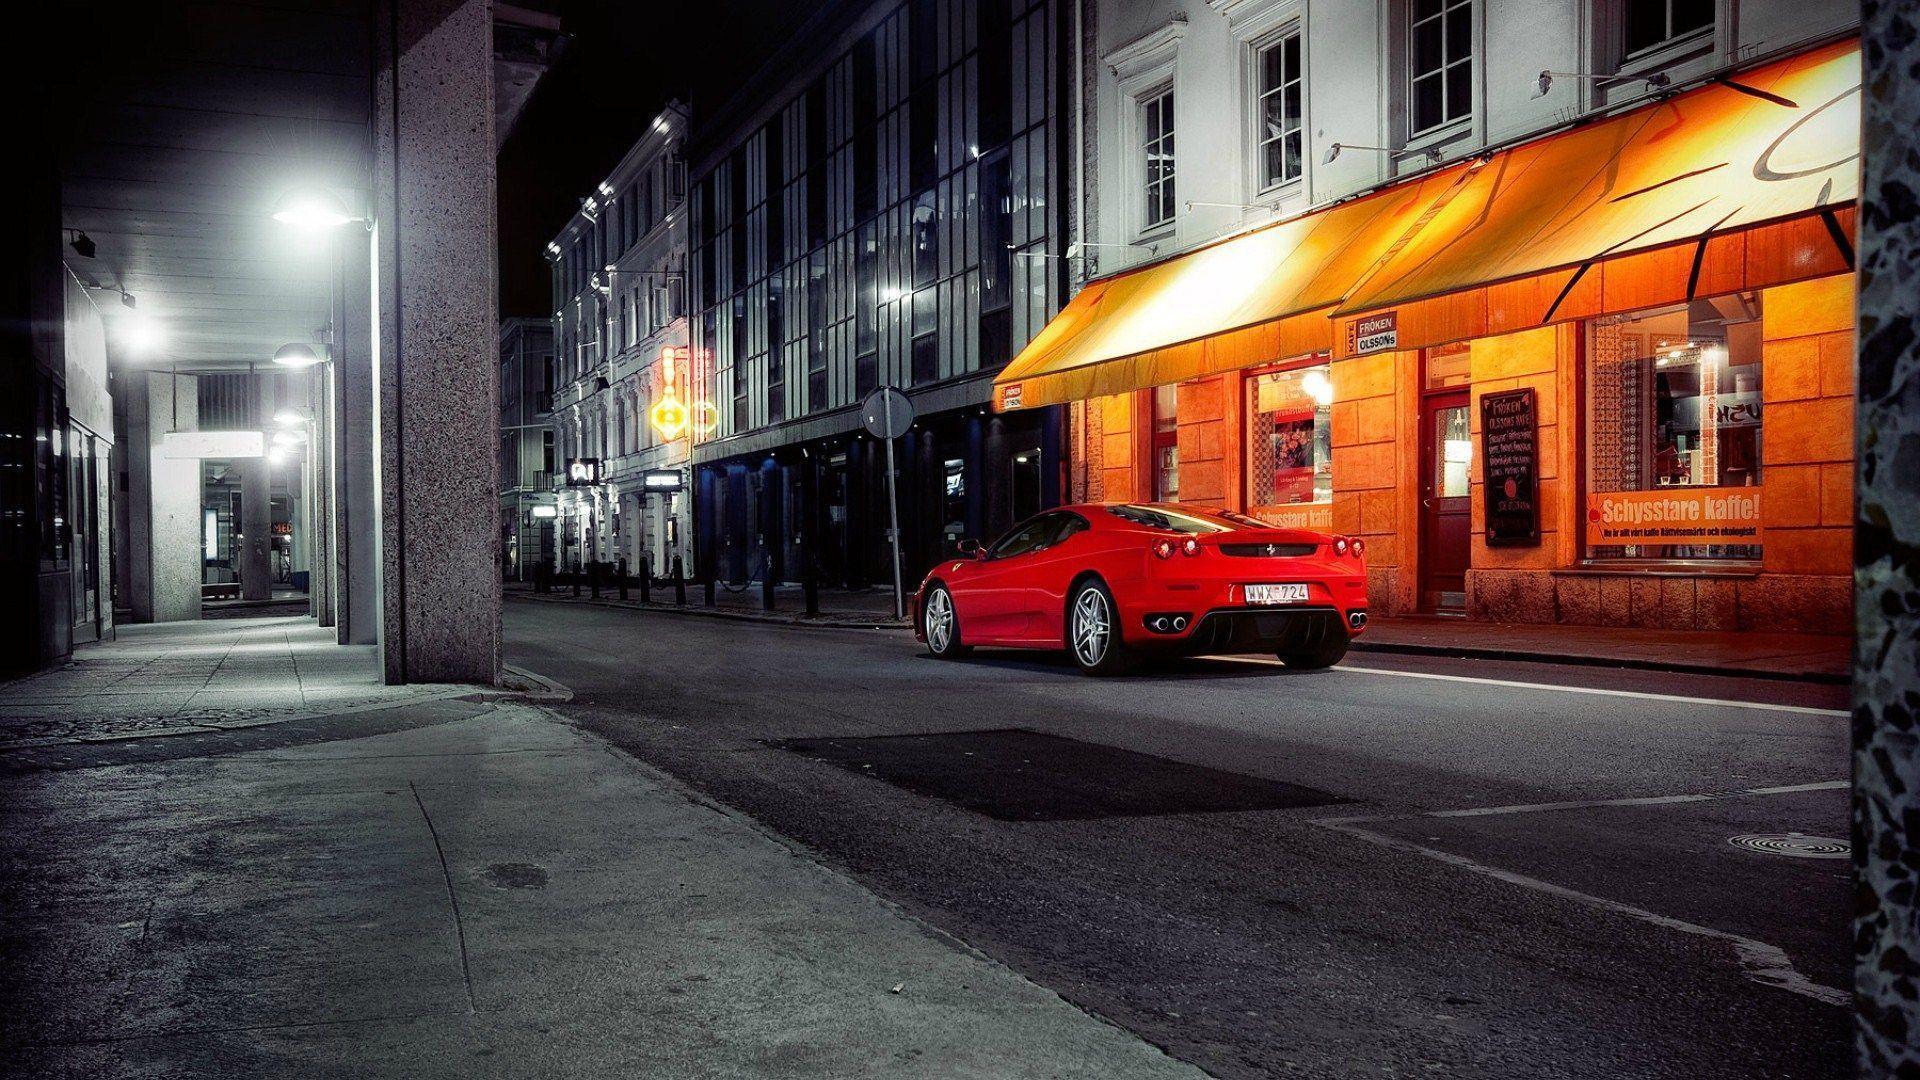 Download Ferrari On Cobblestone Street In Town Hd Wallpaper  Background